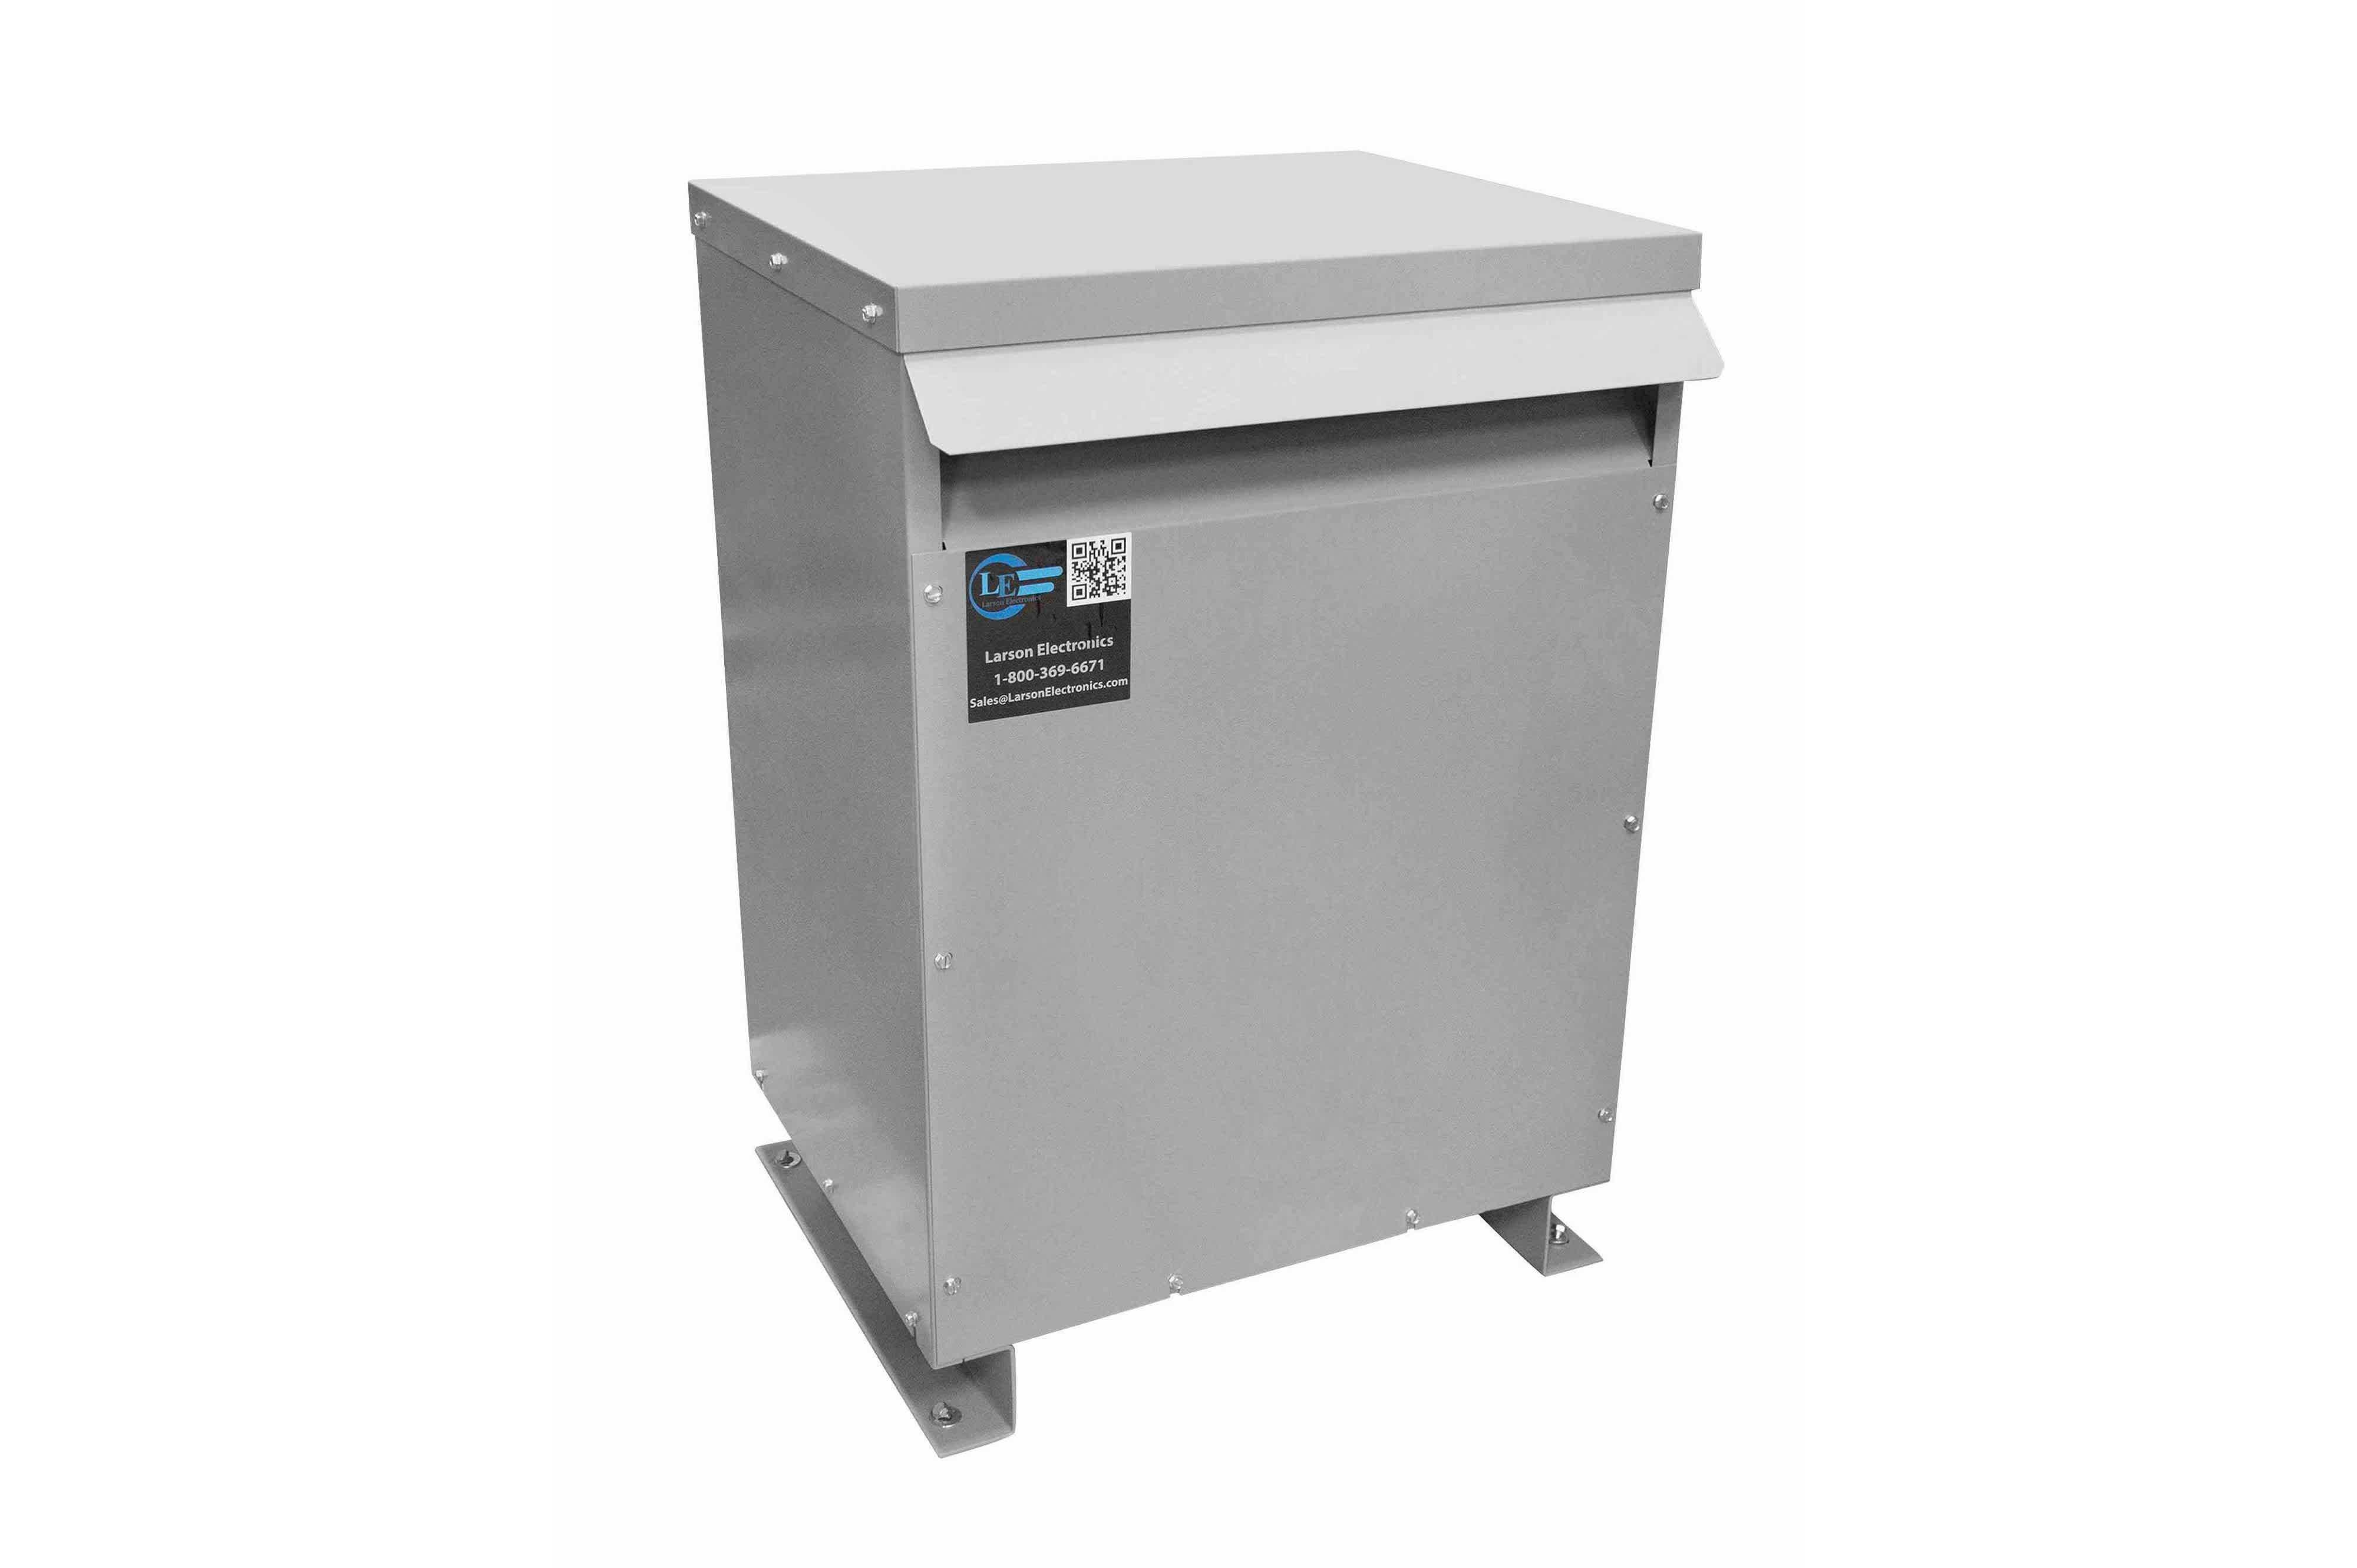 37.5 kVA 3PH Isolation Transformer, 415V Wye Primary, 600Y/347 Wye-N Secondary, N3R, Ventilated, 60 Hz